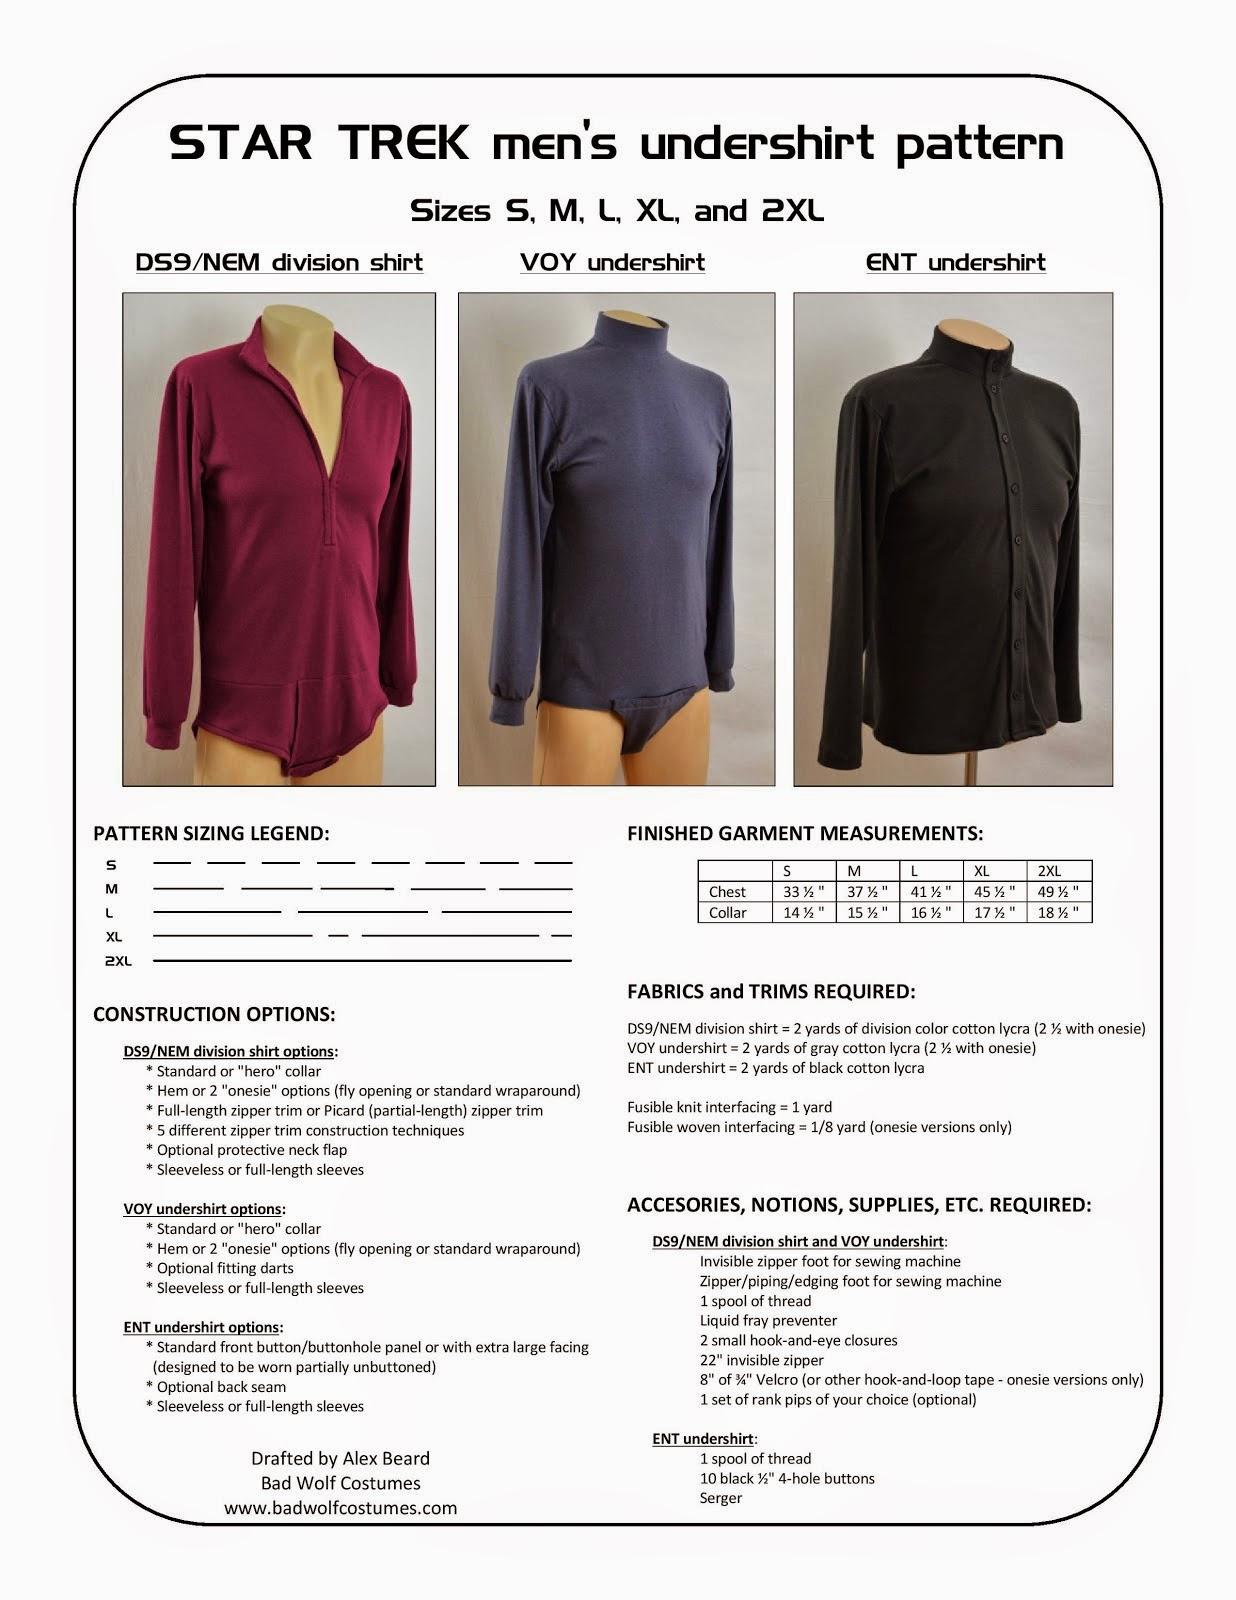 Star Trek: Men's Undershirt Sewing Pattern